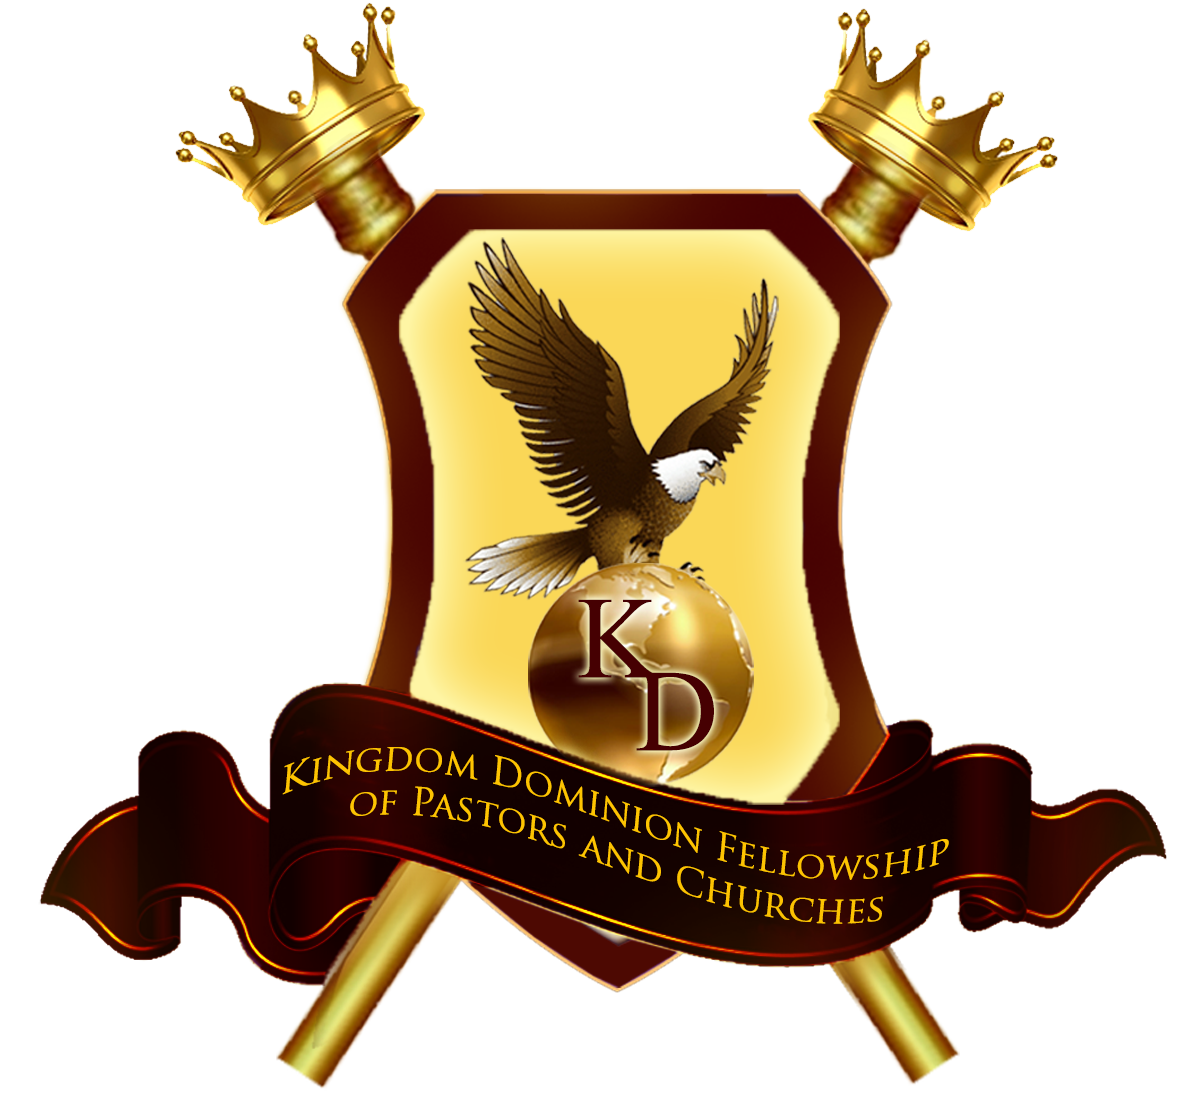 Kingdom dominion international fellowship. Pastor clipart pastor's